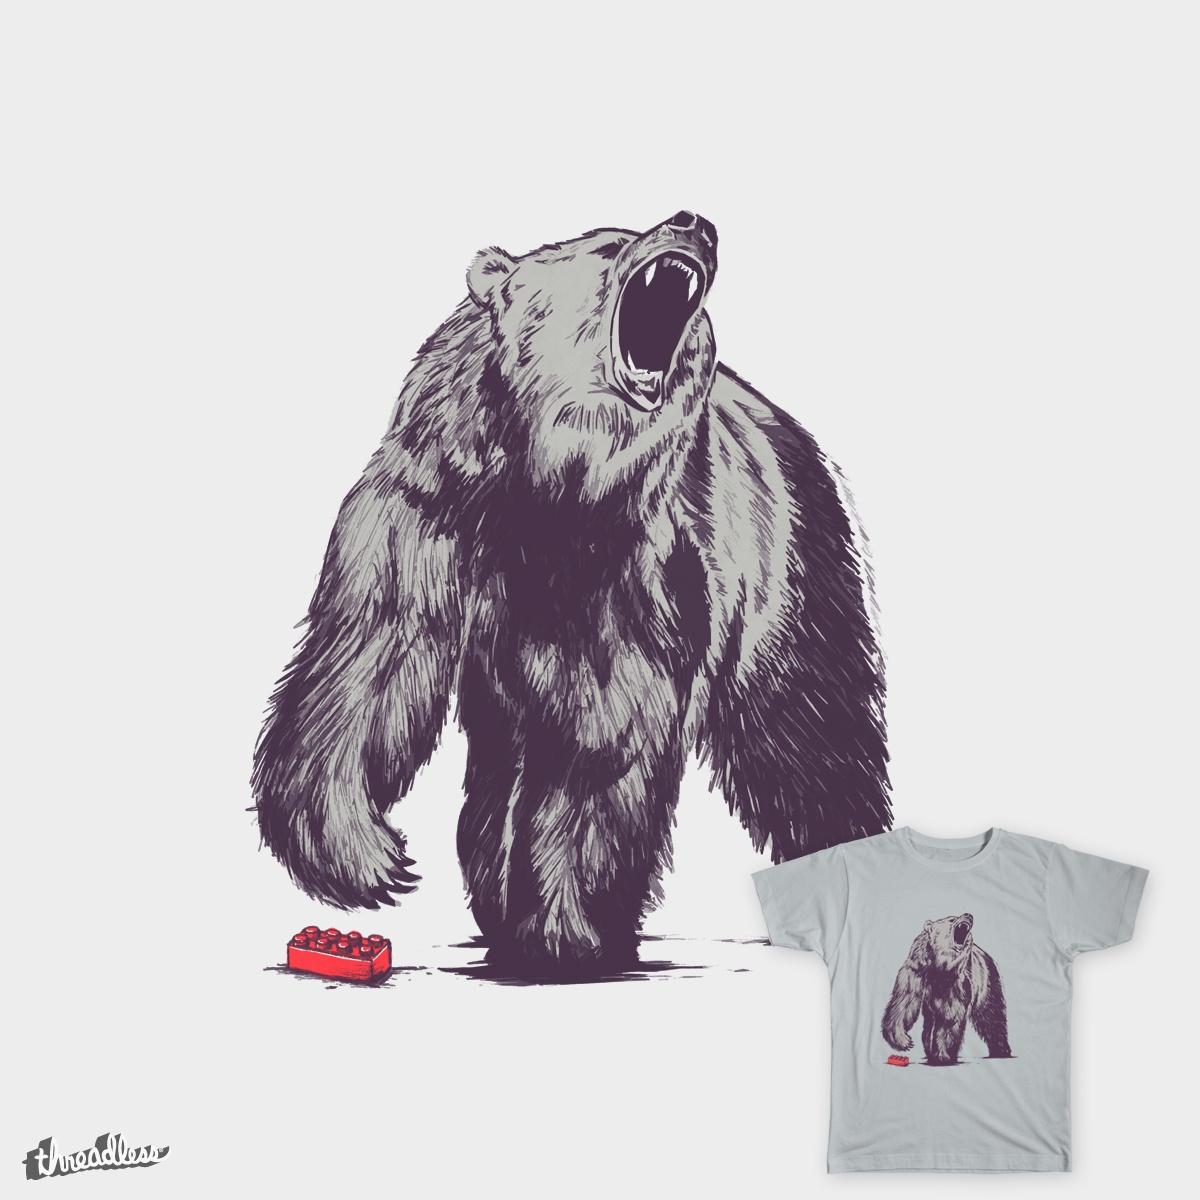 Bear Block by danielteres on Threadless